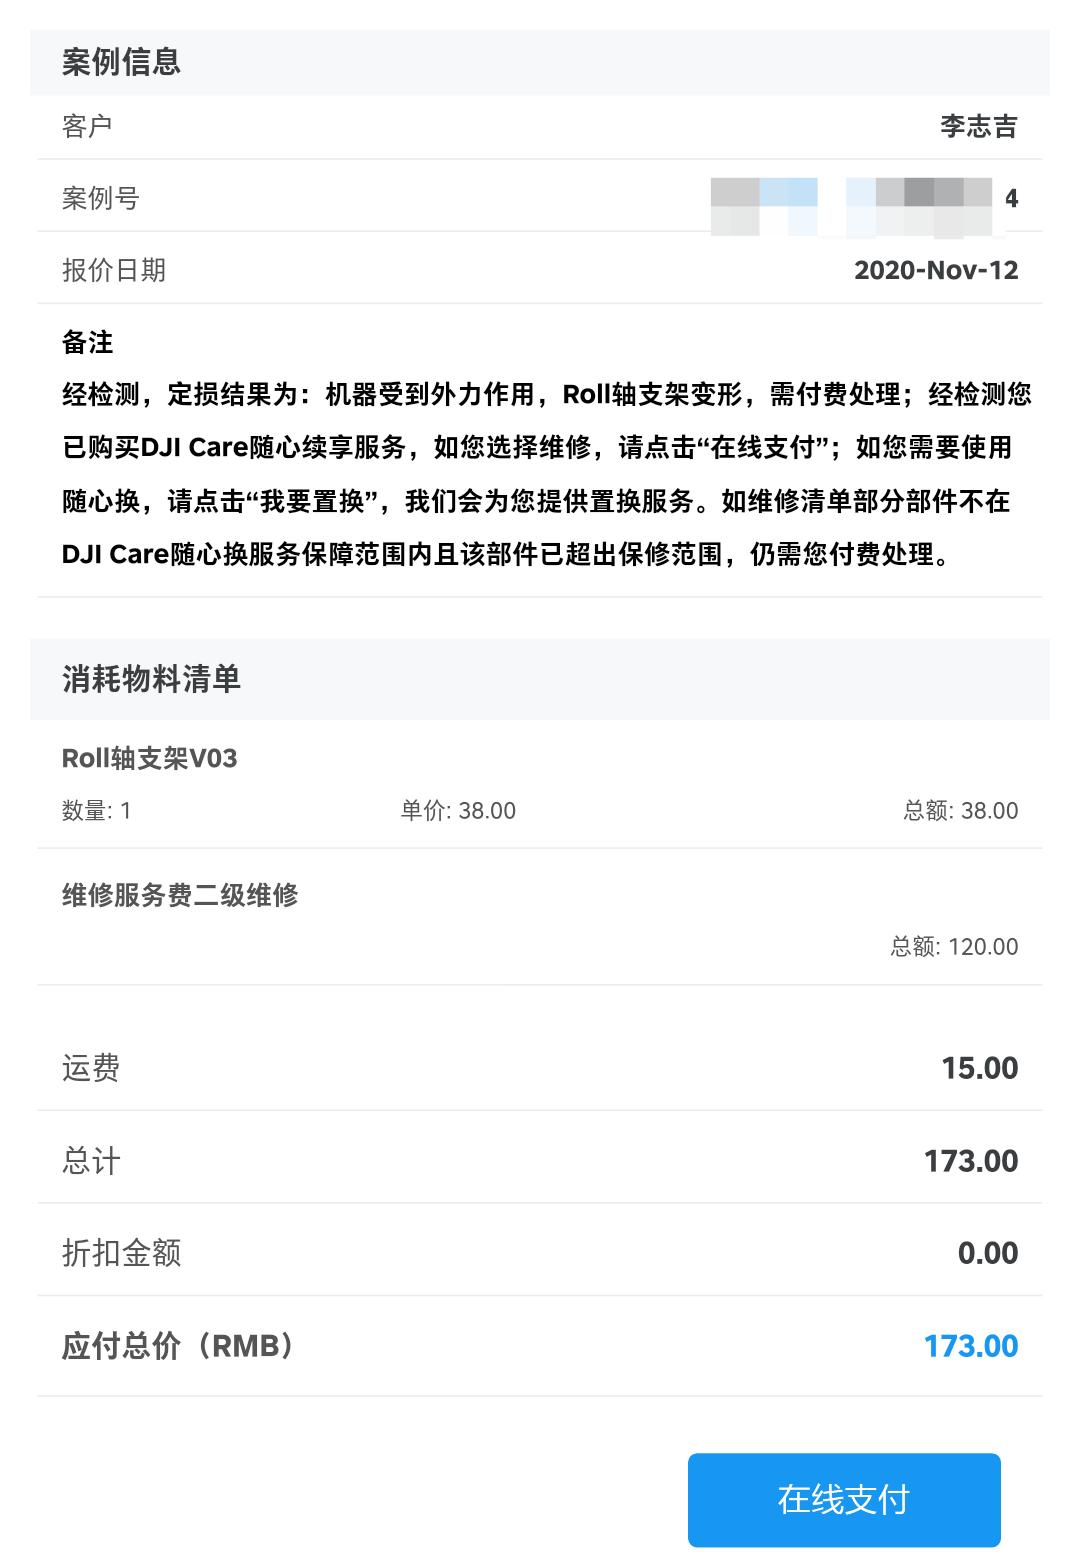 涂鸦_Screenshot_2020-11-12-11-09-00-296_QQ邮箱.png